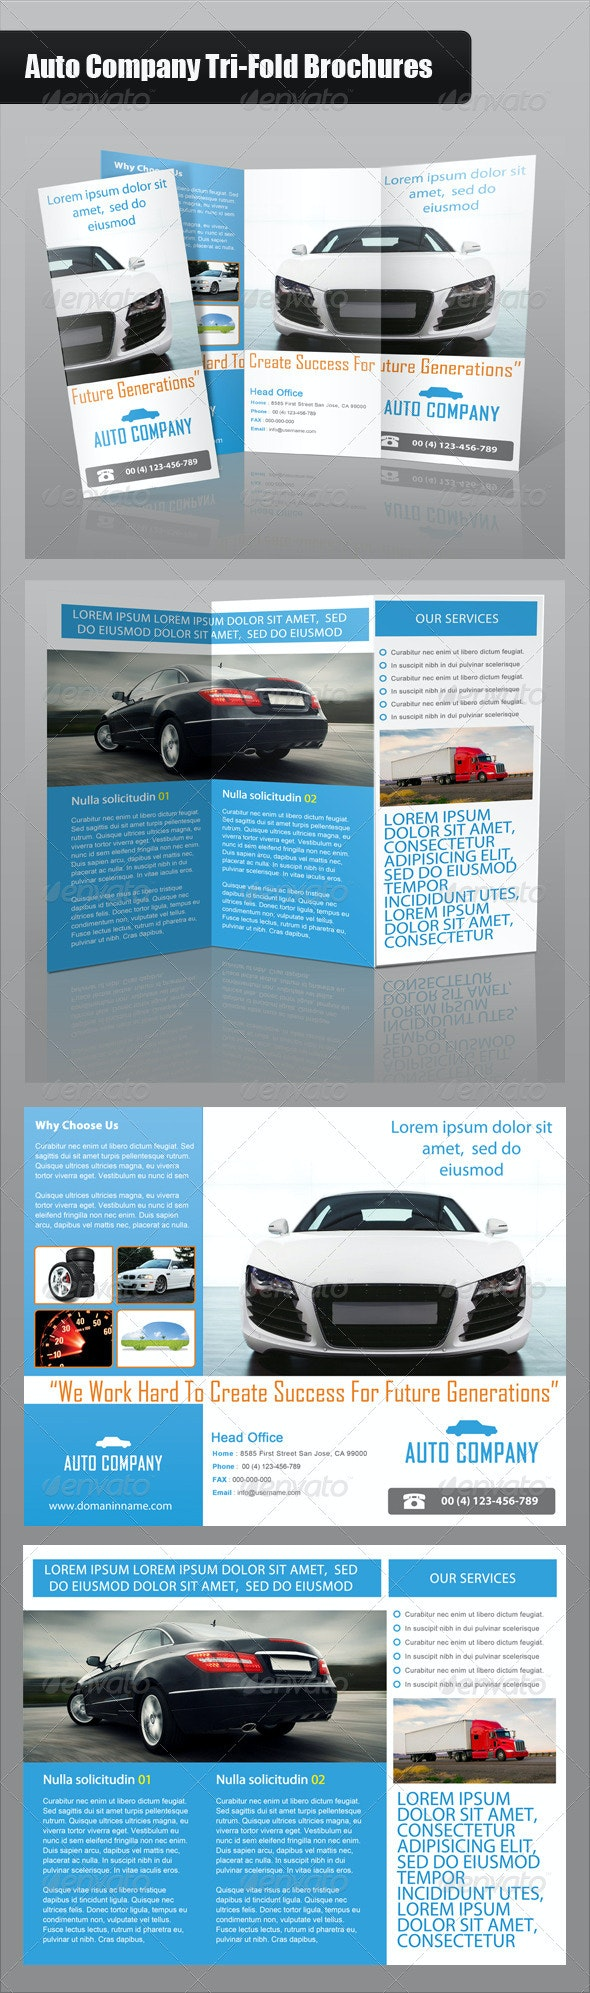 Auto Company Tri-Fold Brochure - Brochures Print Templates